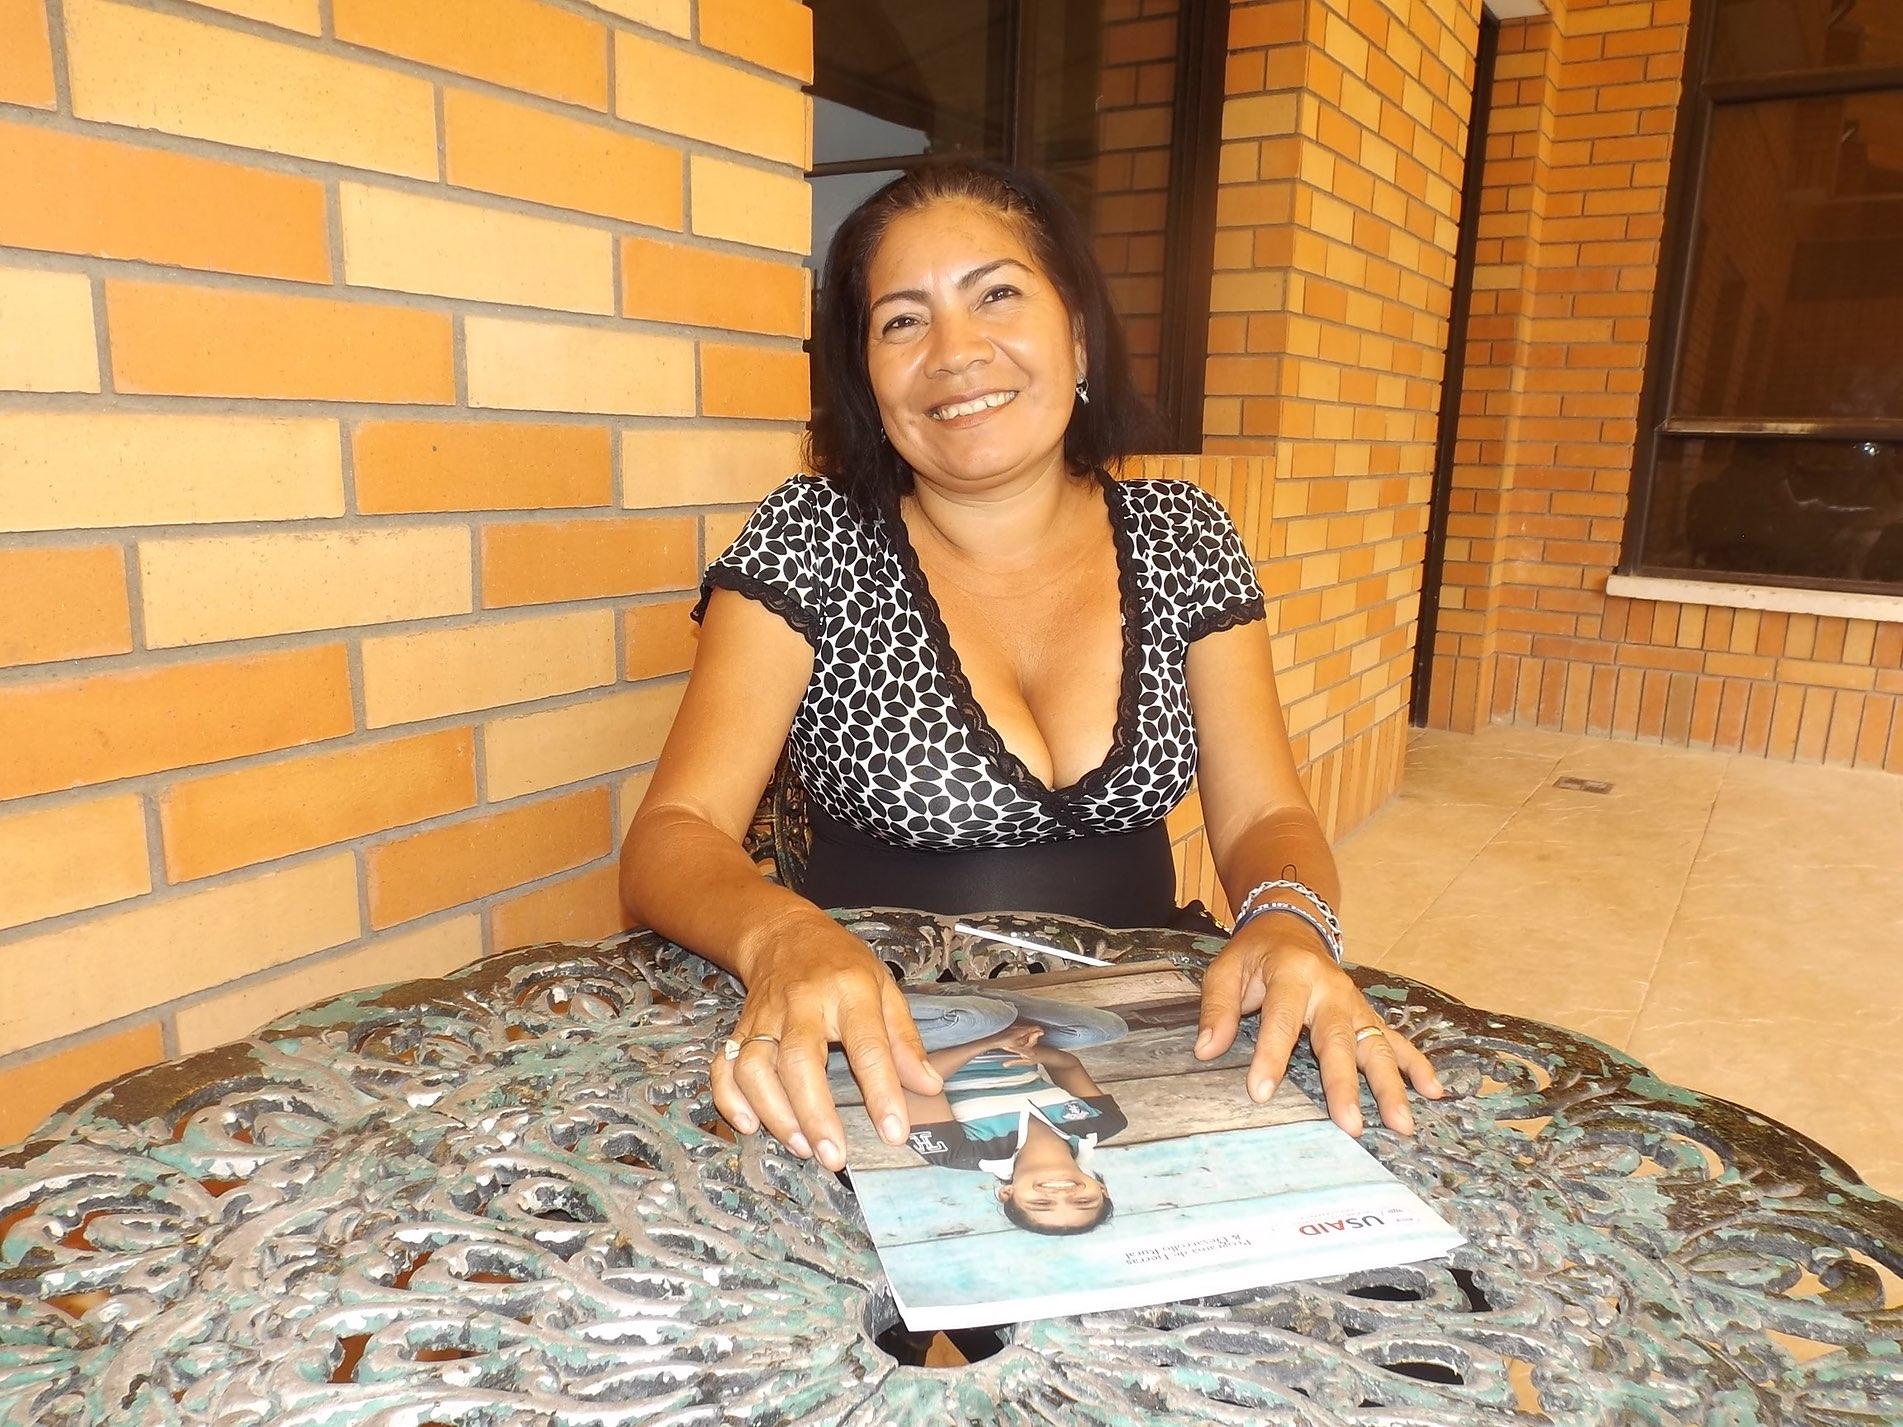 Deyis Carmona Tejeda, from Cesar, Colombia